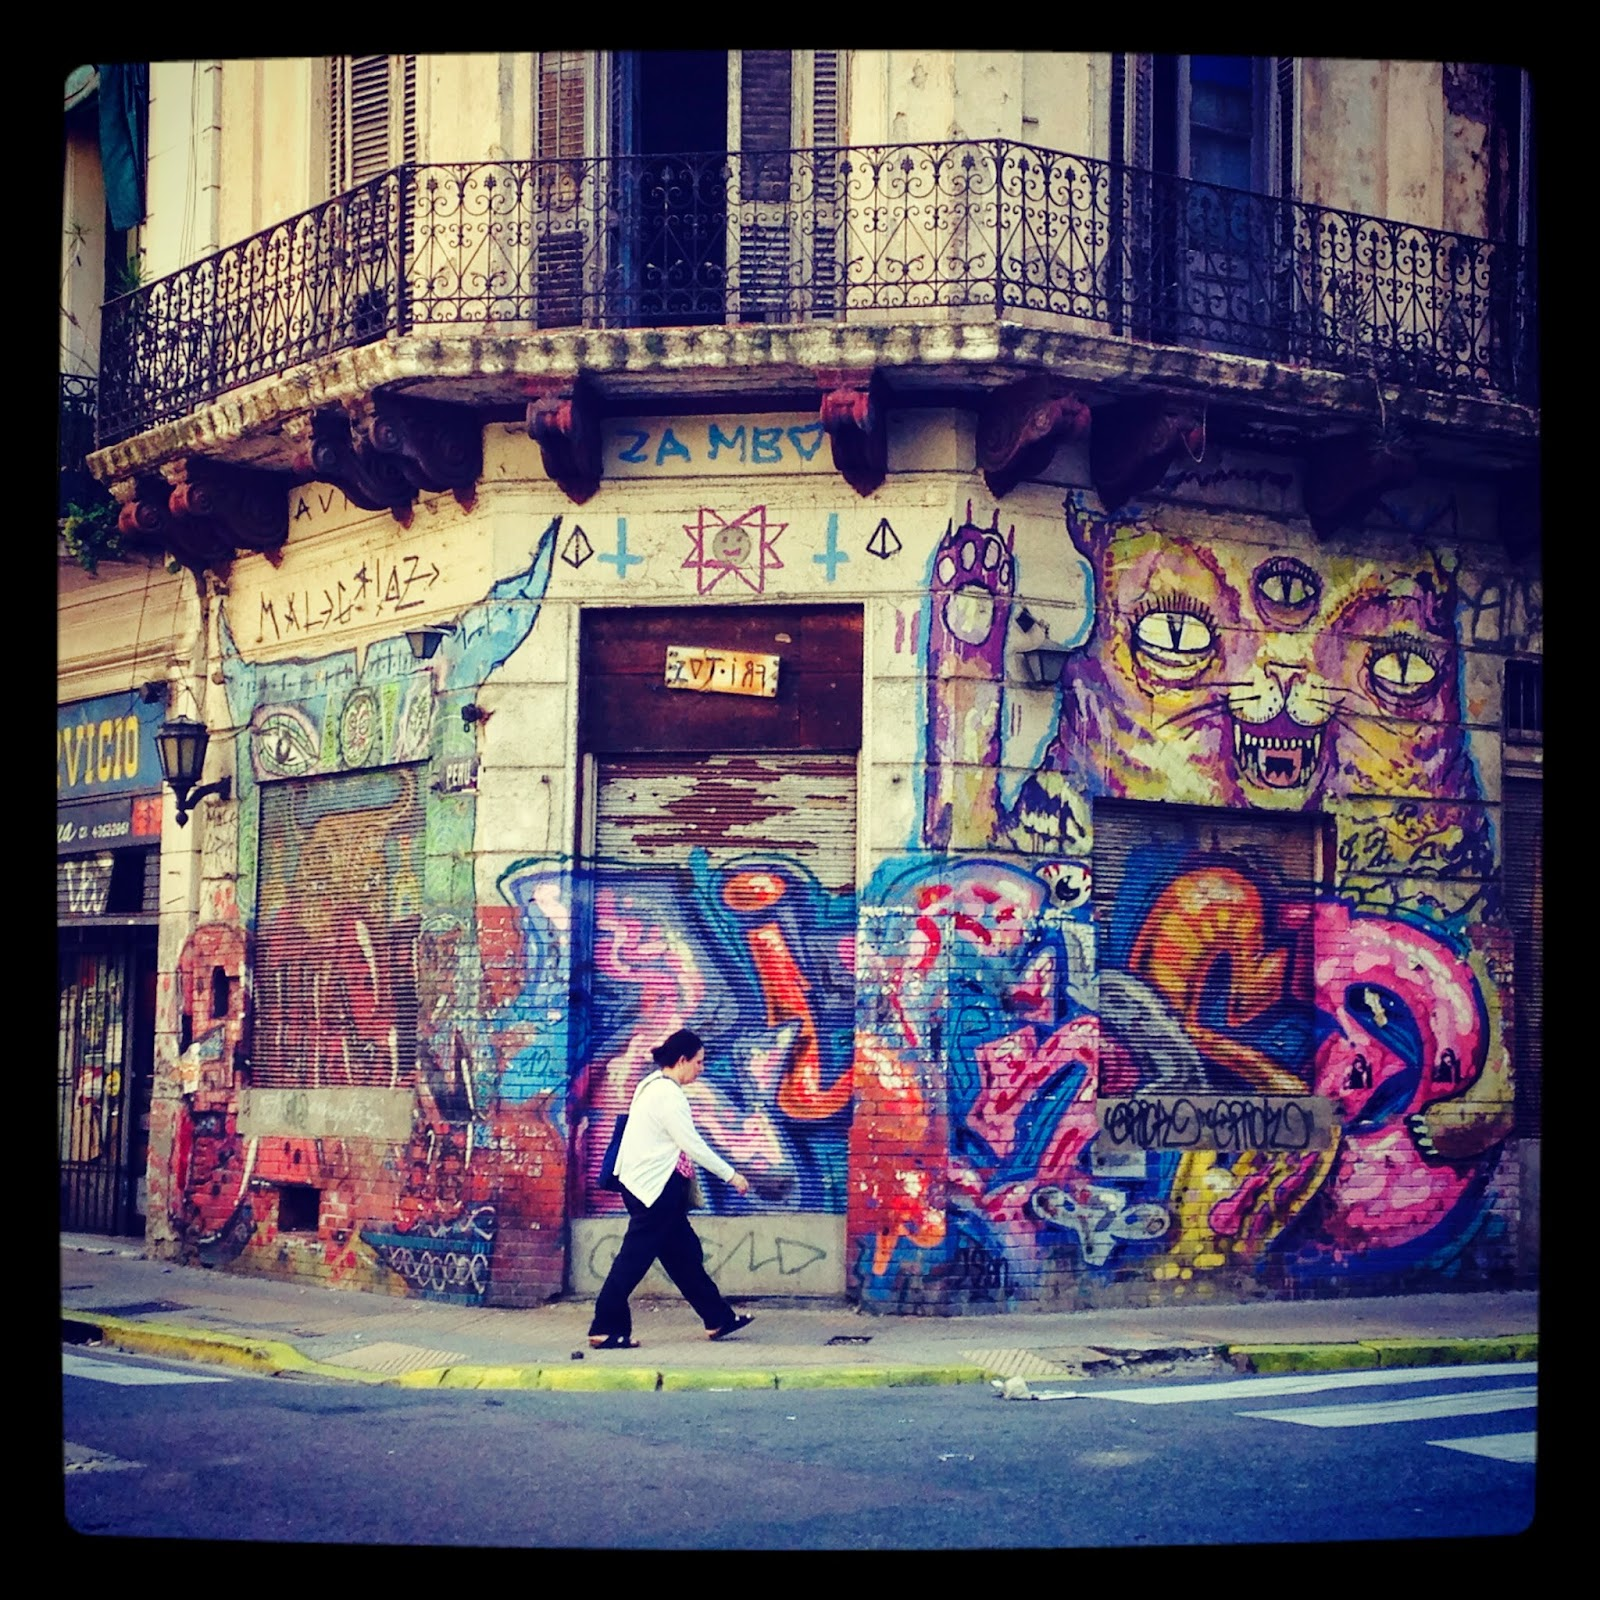 street art graffiti buenos aires argentina